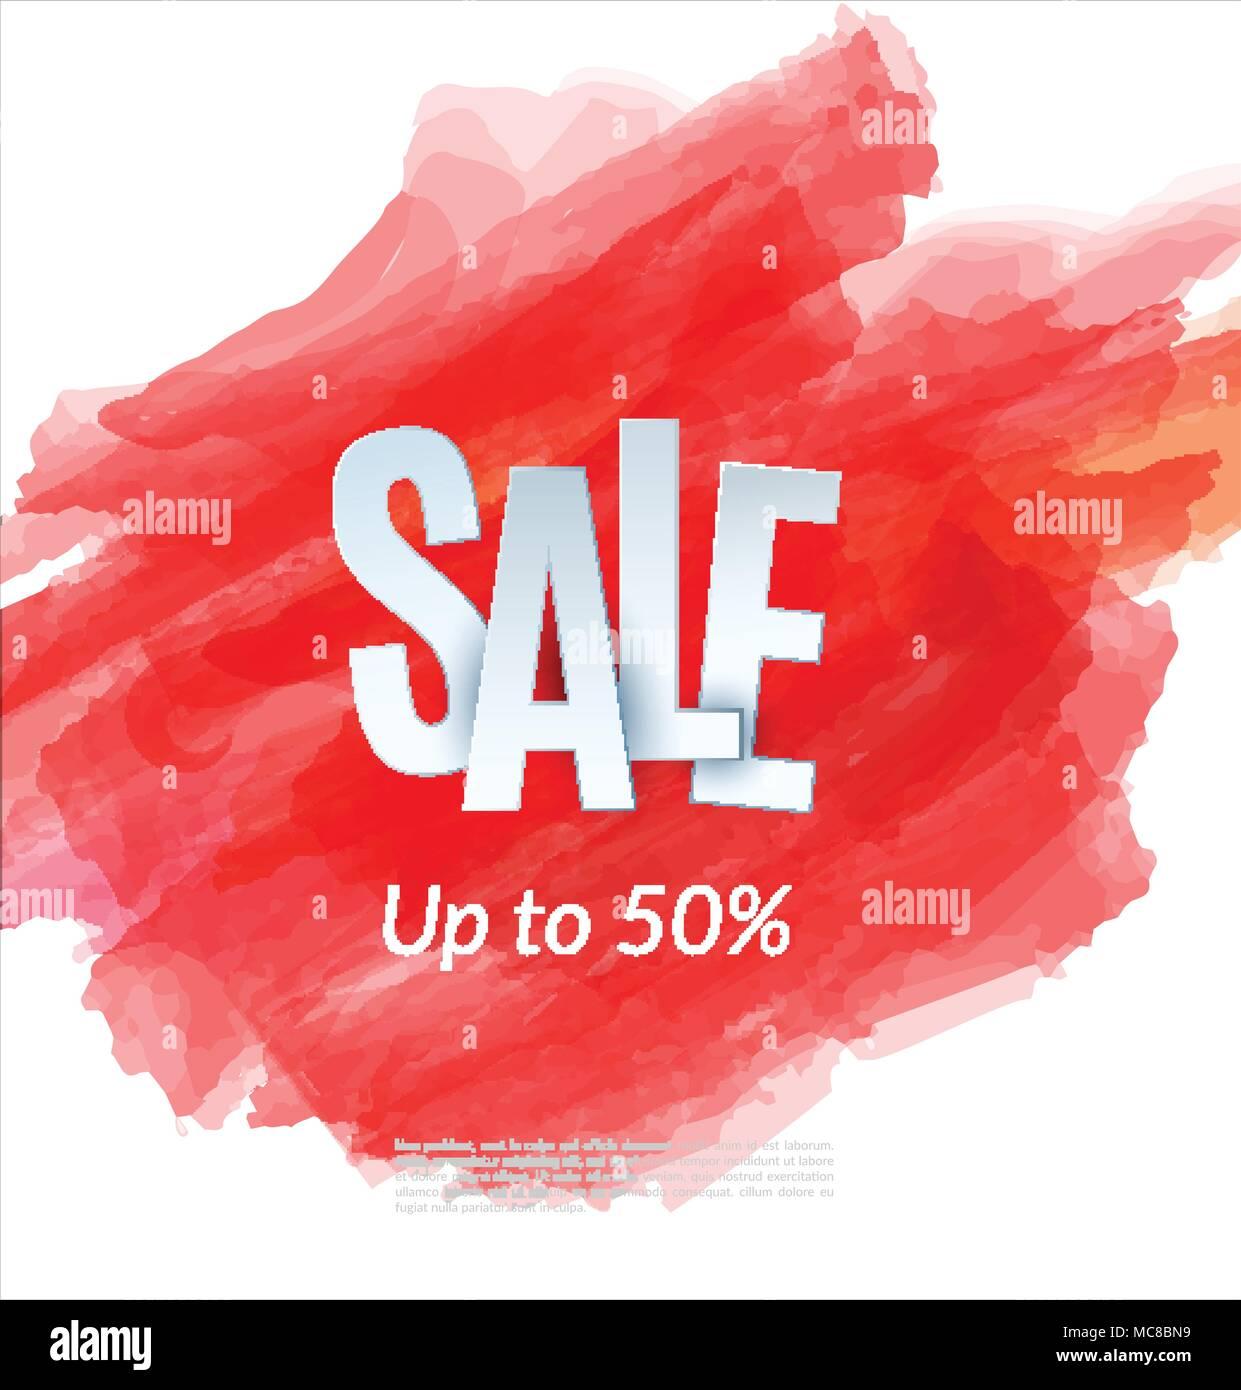 sale artistic banner template design on red sketch background